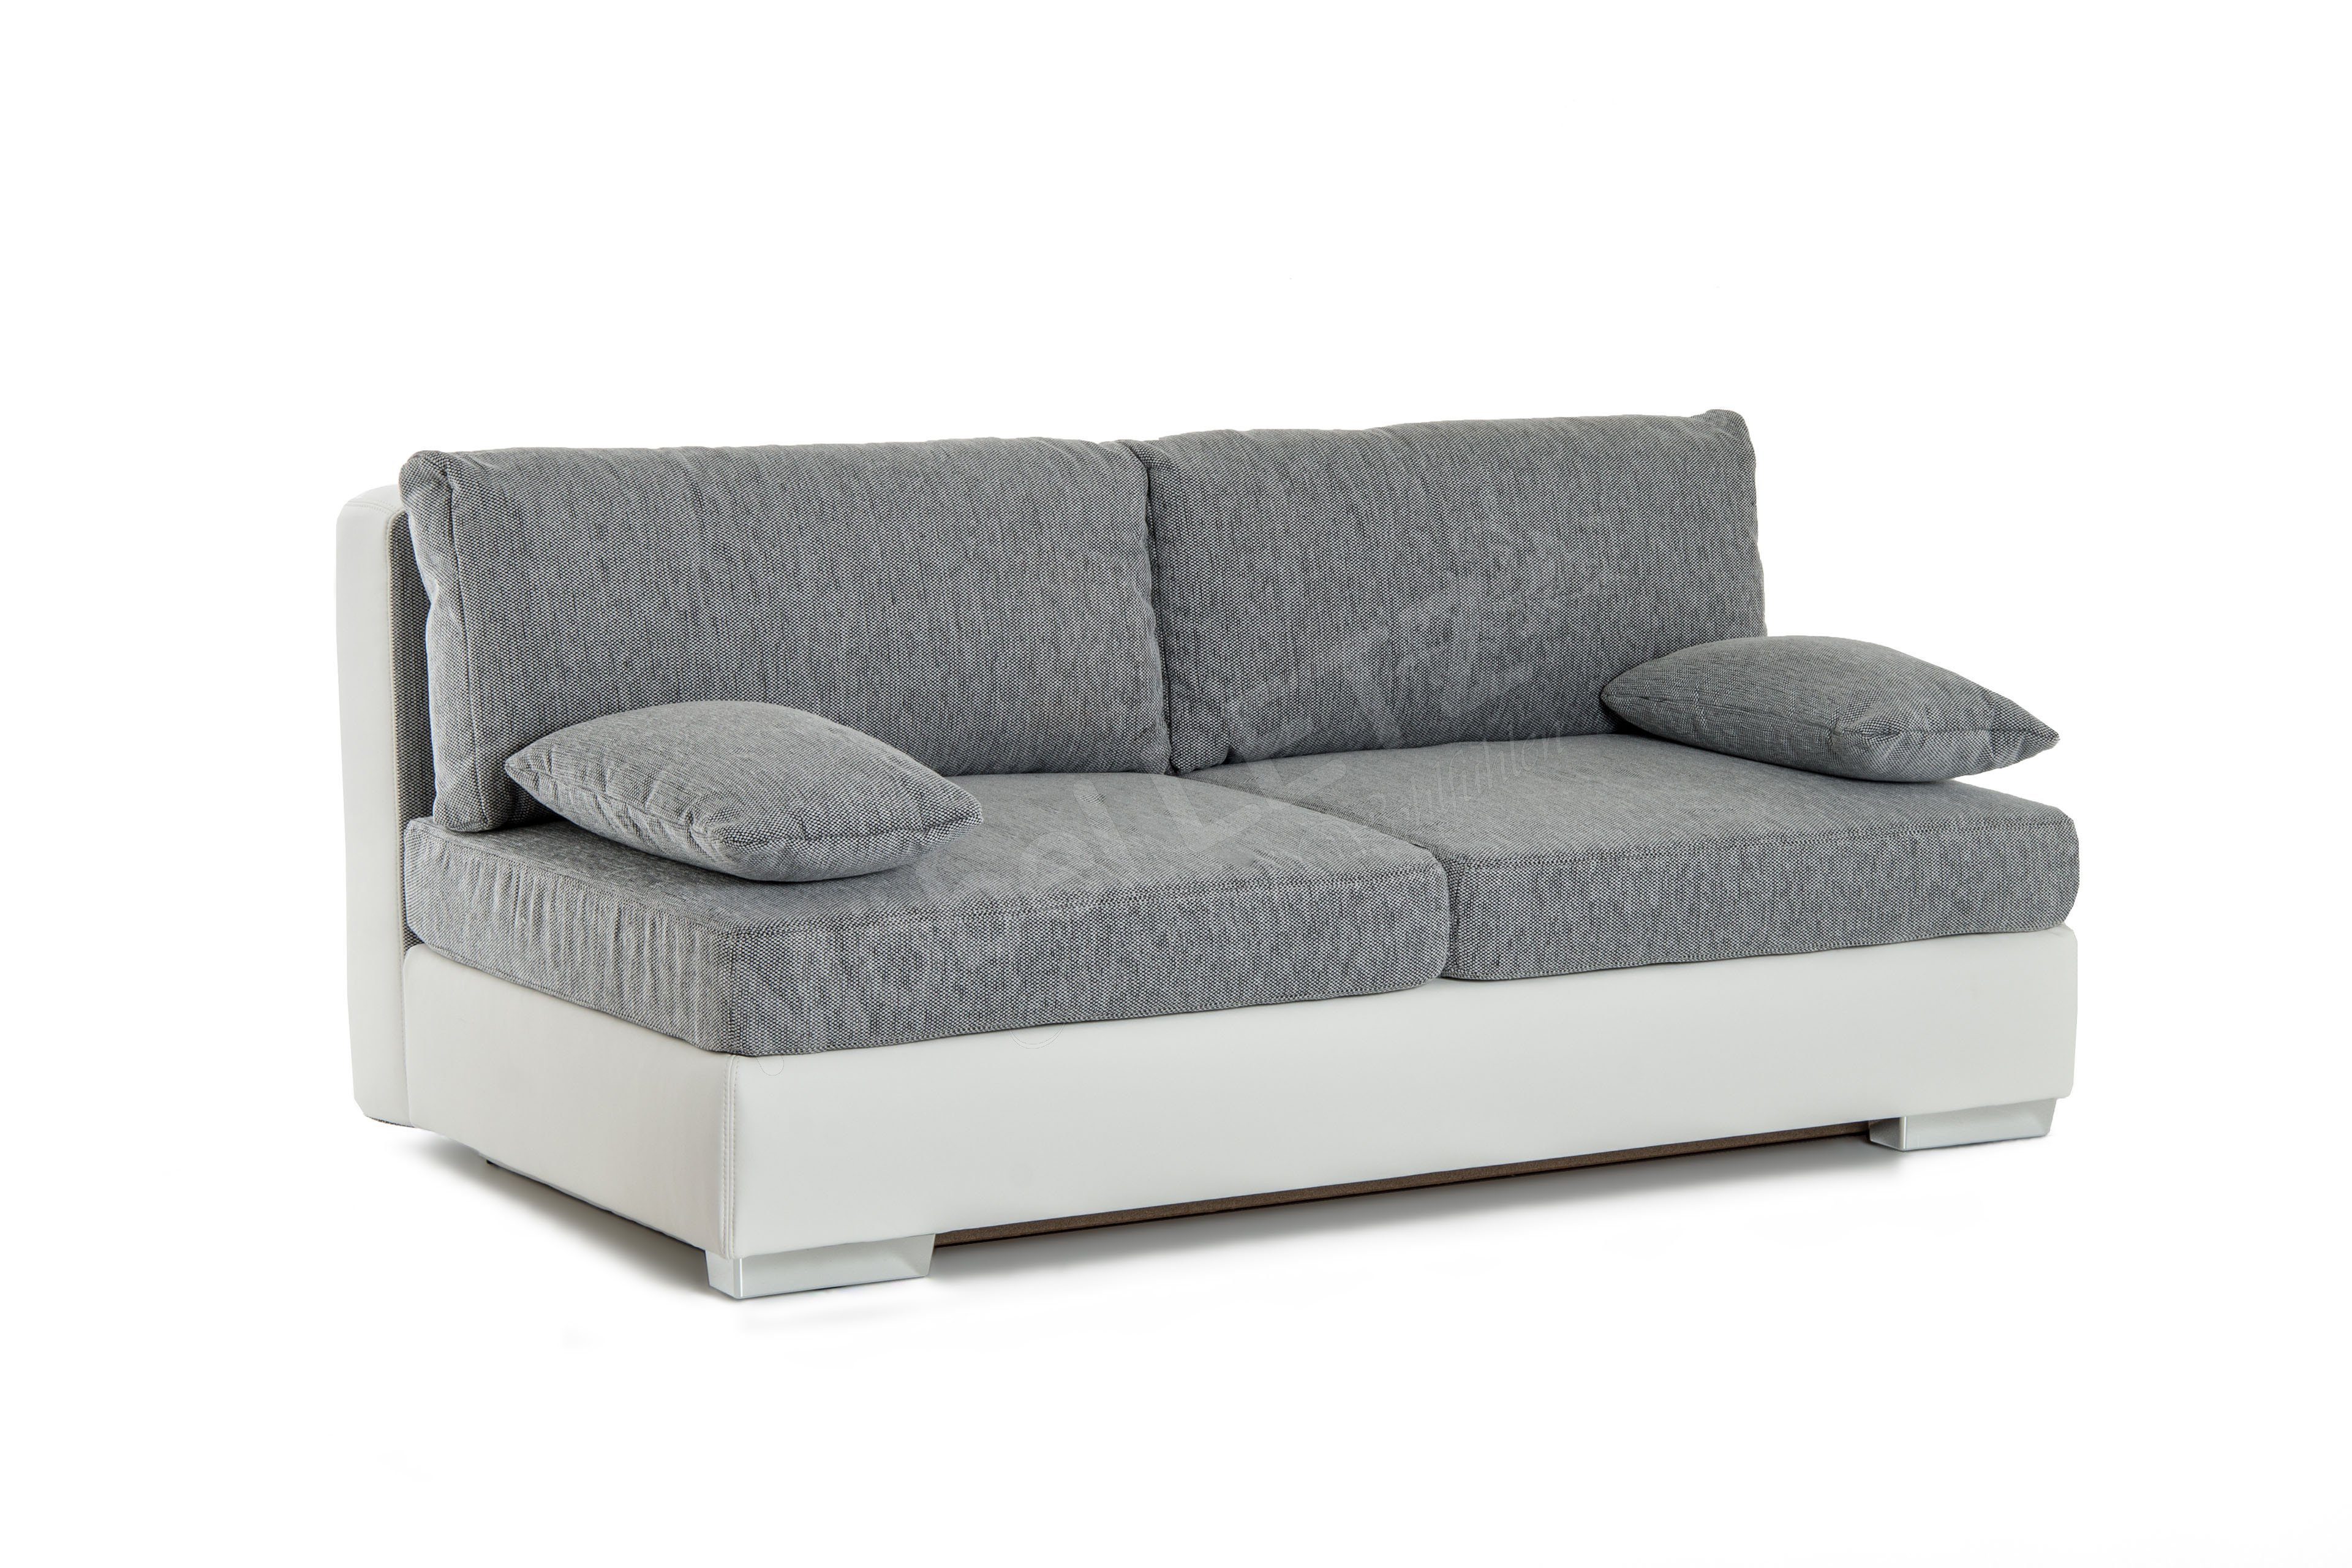 kollektion letz schlafsofa vicy wei grau m bel letz. Black Bedroom Furniture Sets. Home Design Ideas